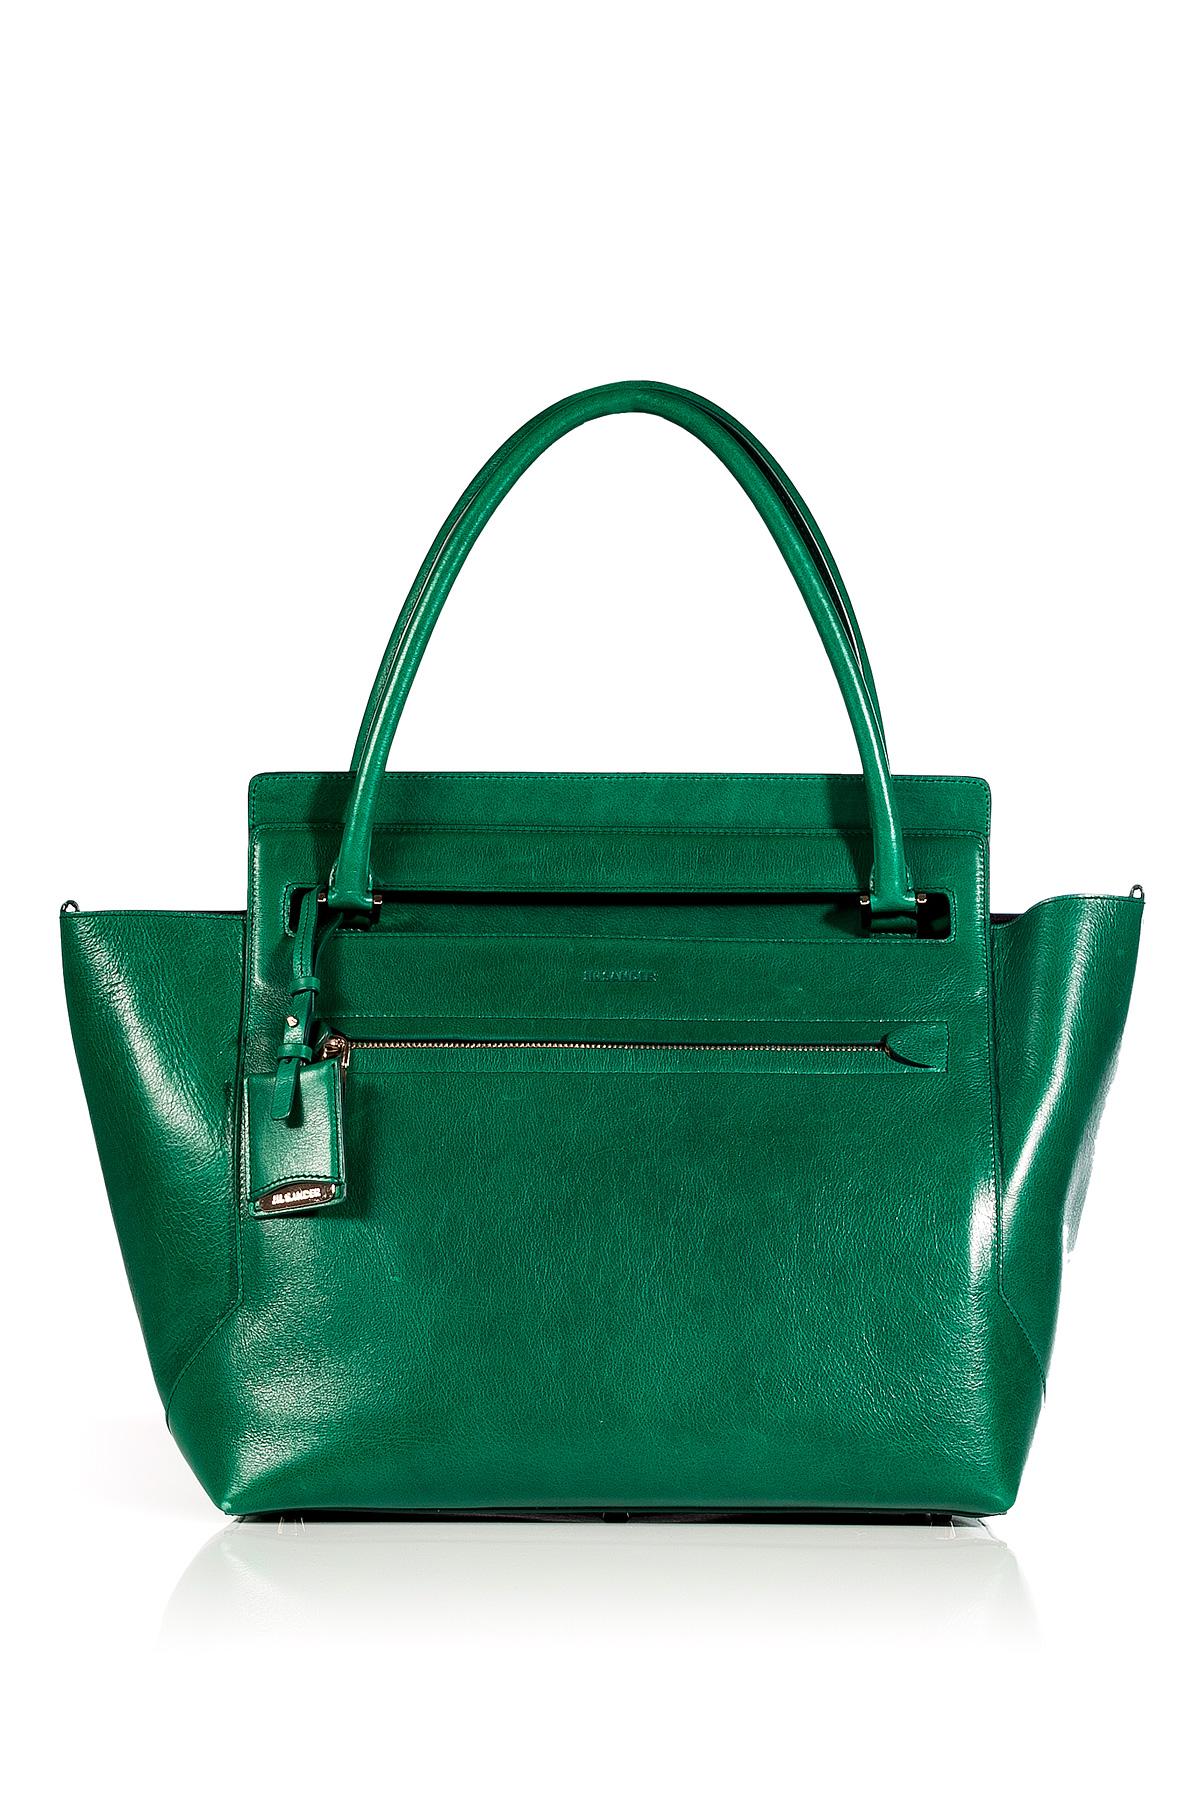 7fb5483a58 Lyst - Jil Sander Emerald Leather New Malavoglia Bag in Green